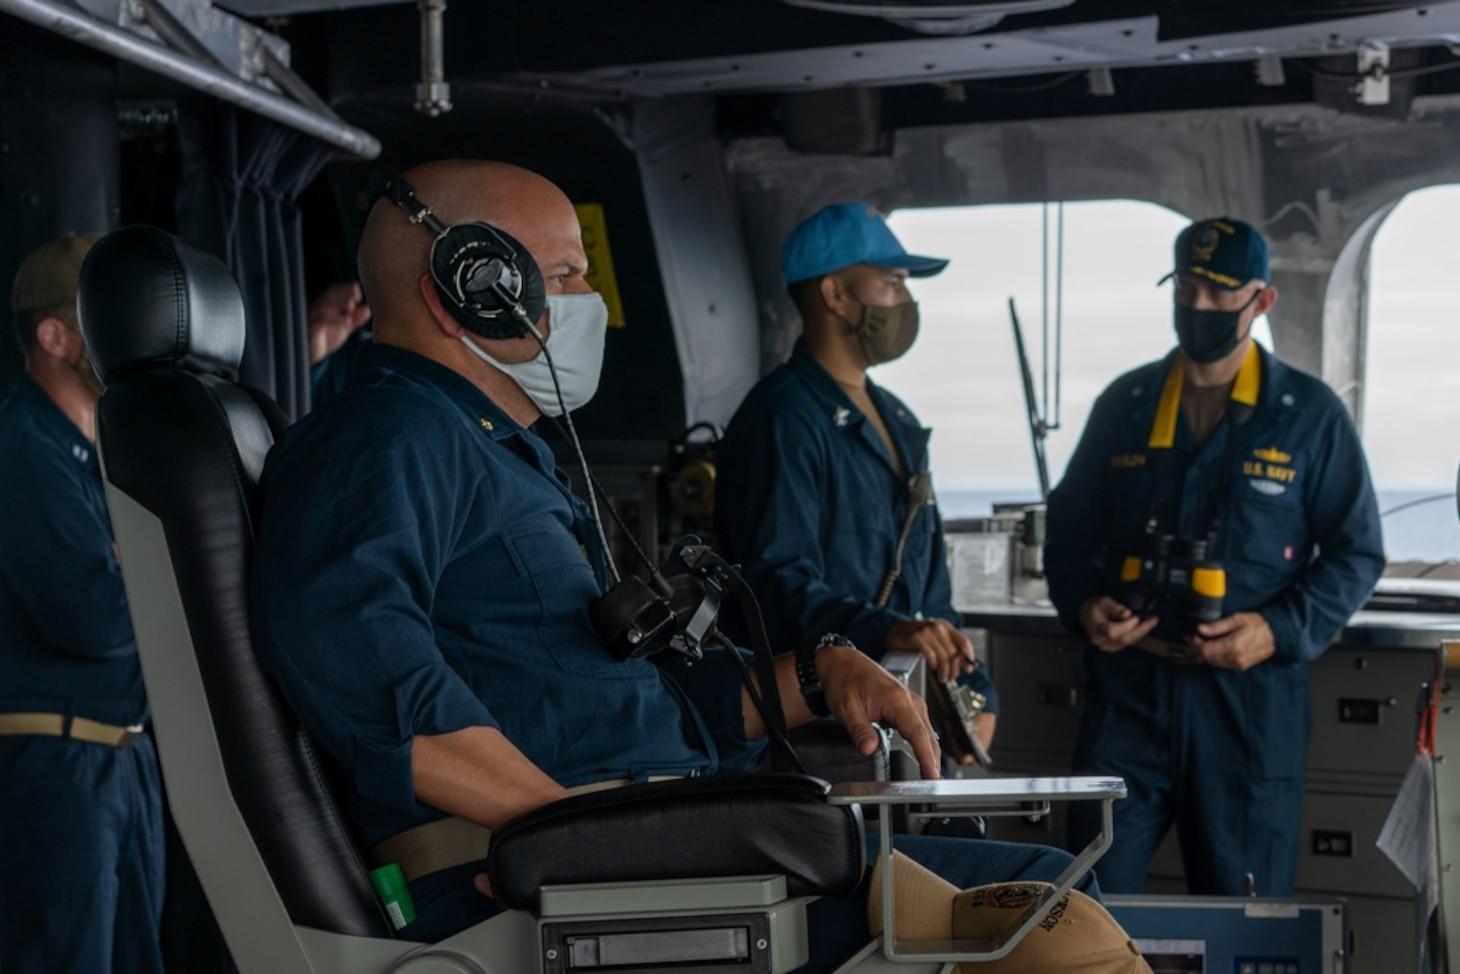 USS Jackson (LCS 6) Sailor Stands Watch